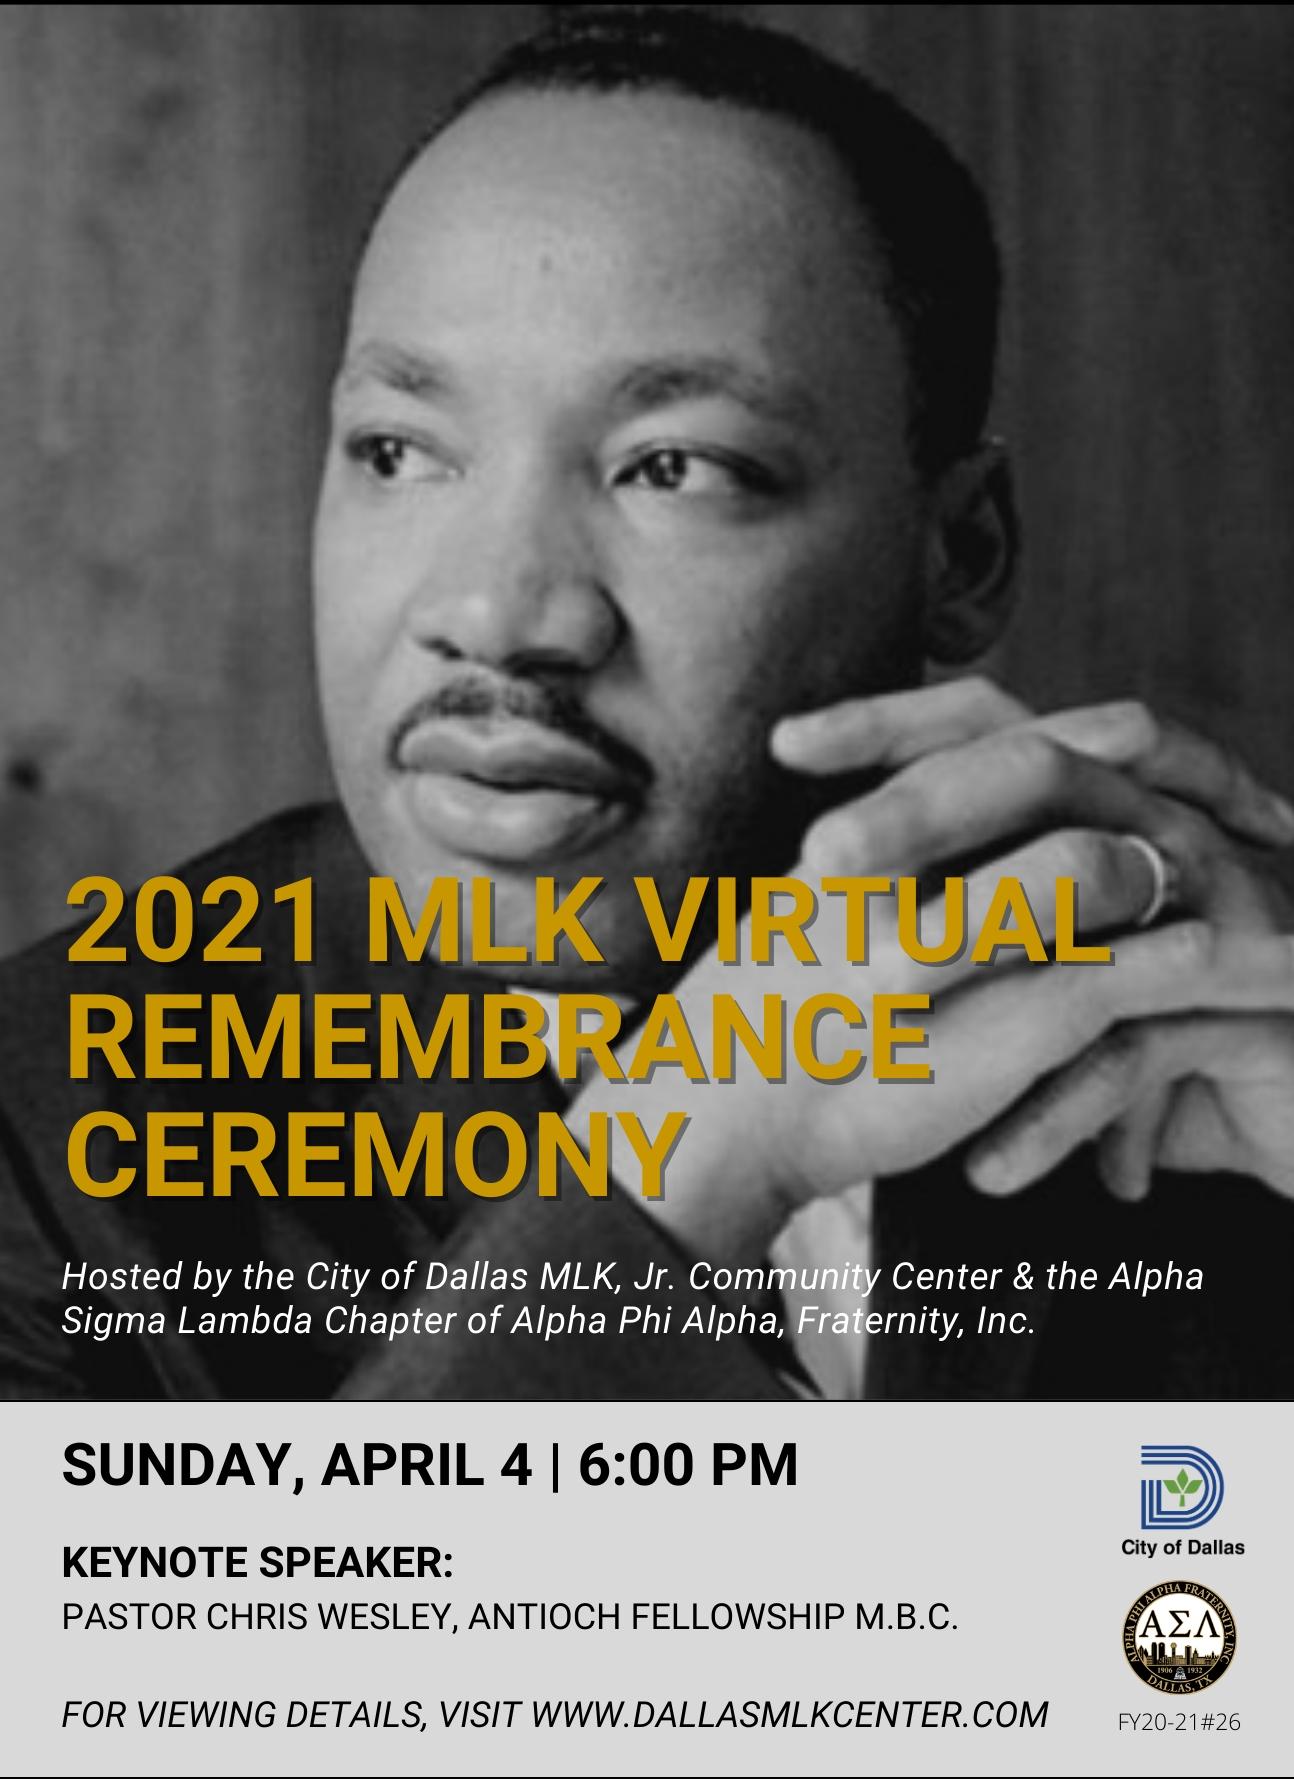 MLK Remembrance Ceremony (Virtual)